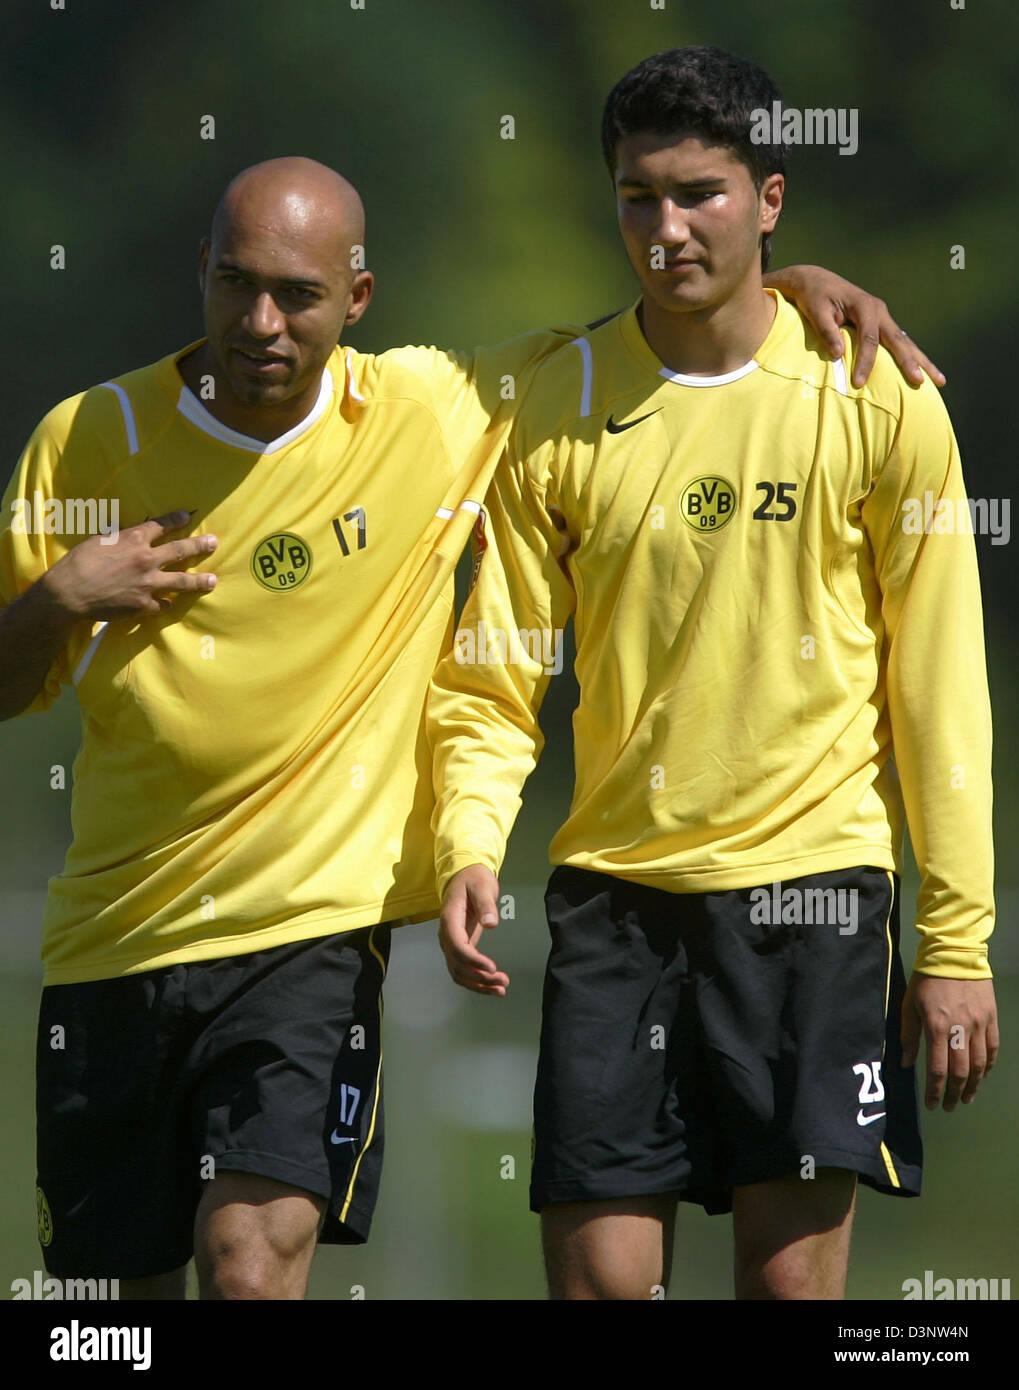 Soccer pros (L-R) Leonardo Dede and Nuri Sahin of Bundesliga club Borussia Dortmund shown during the first training - Stock Image